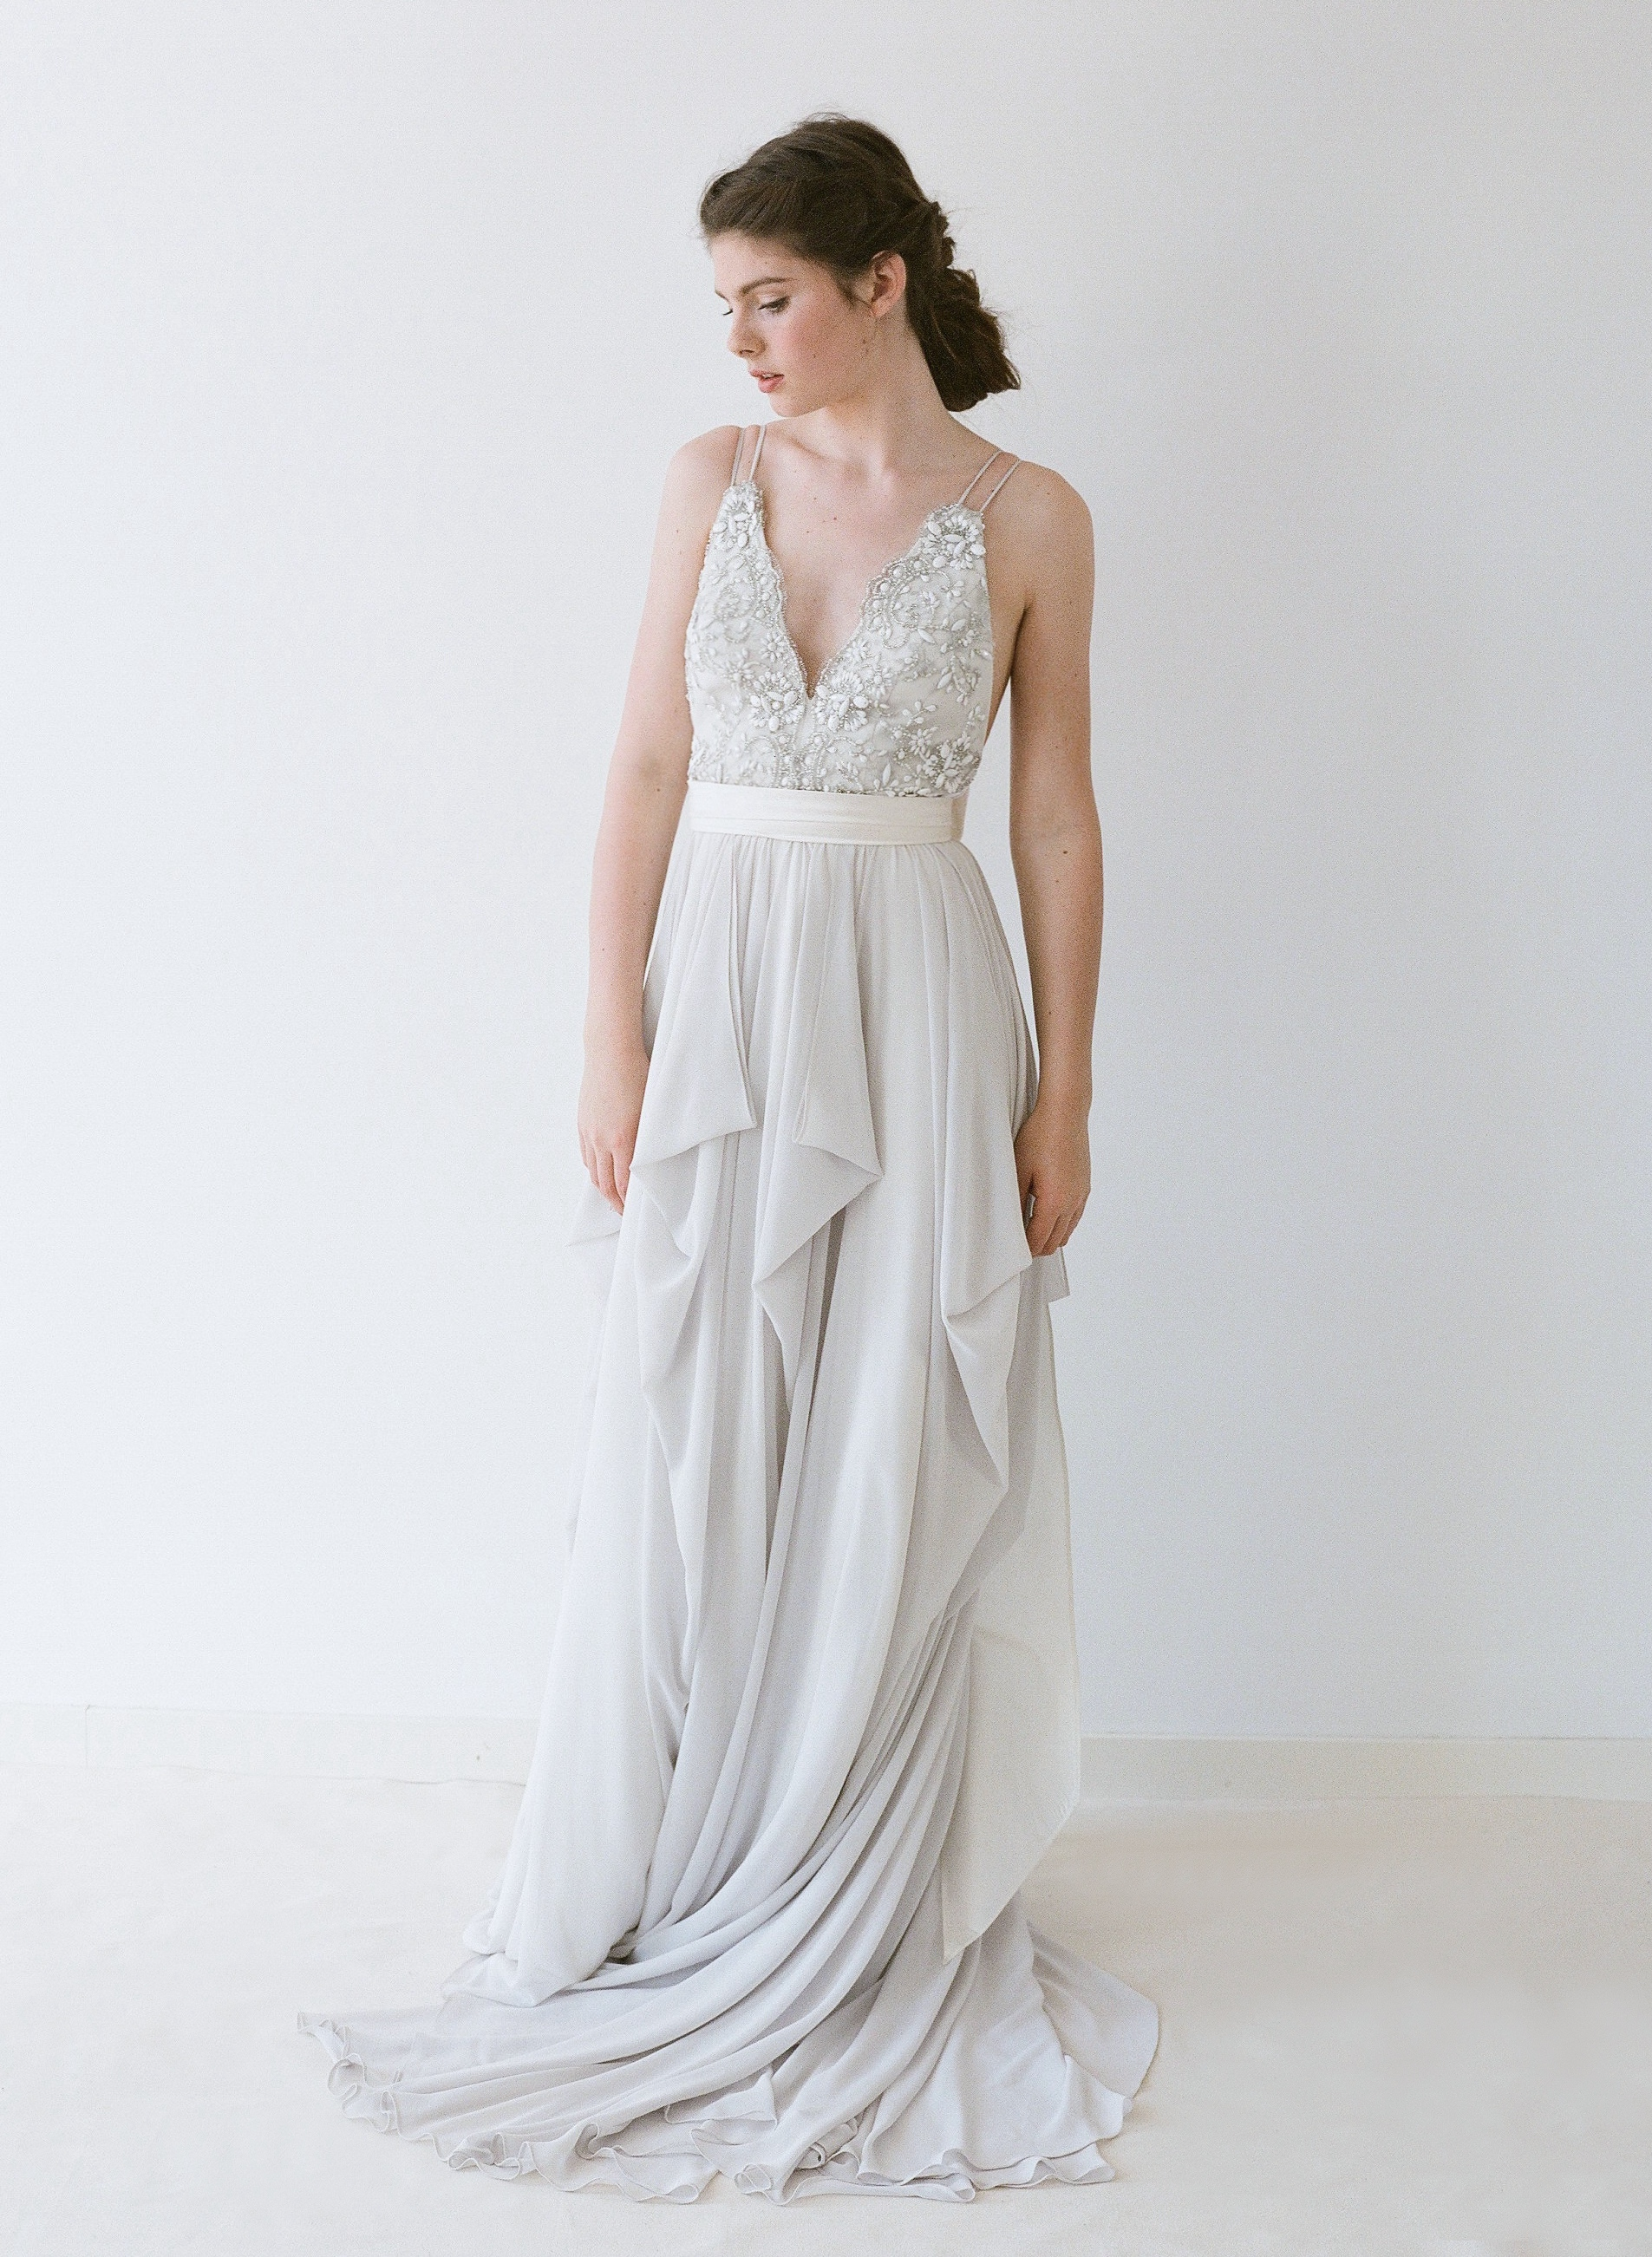 Alexandra wedding dress by Truvelle